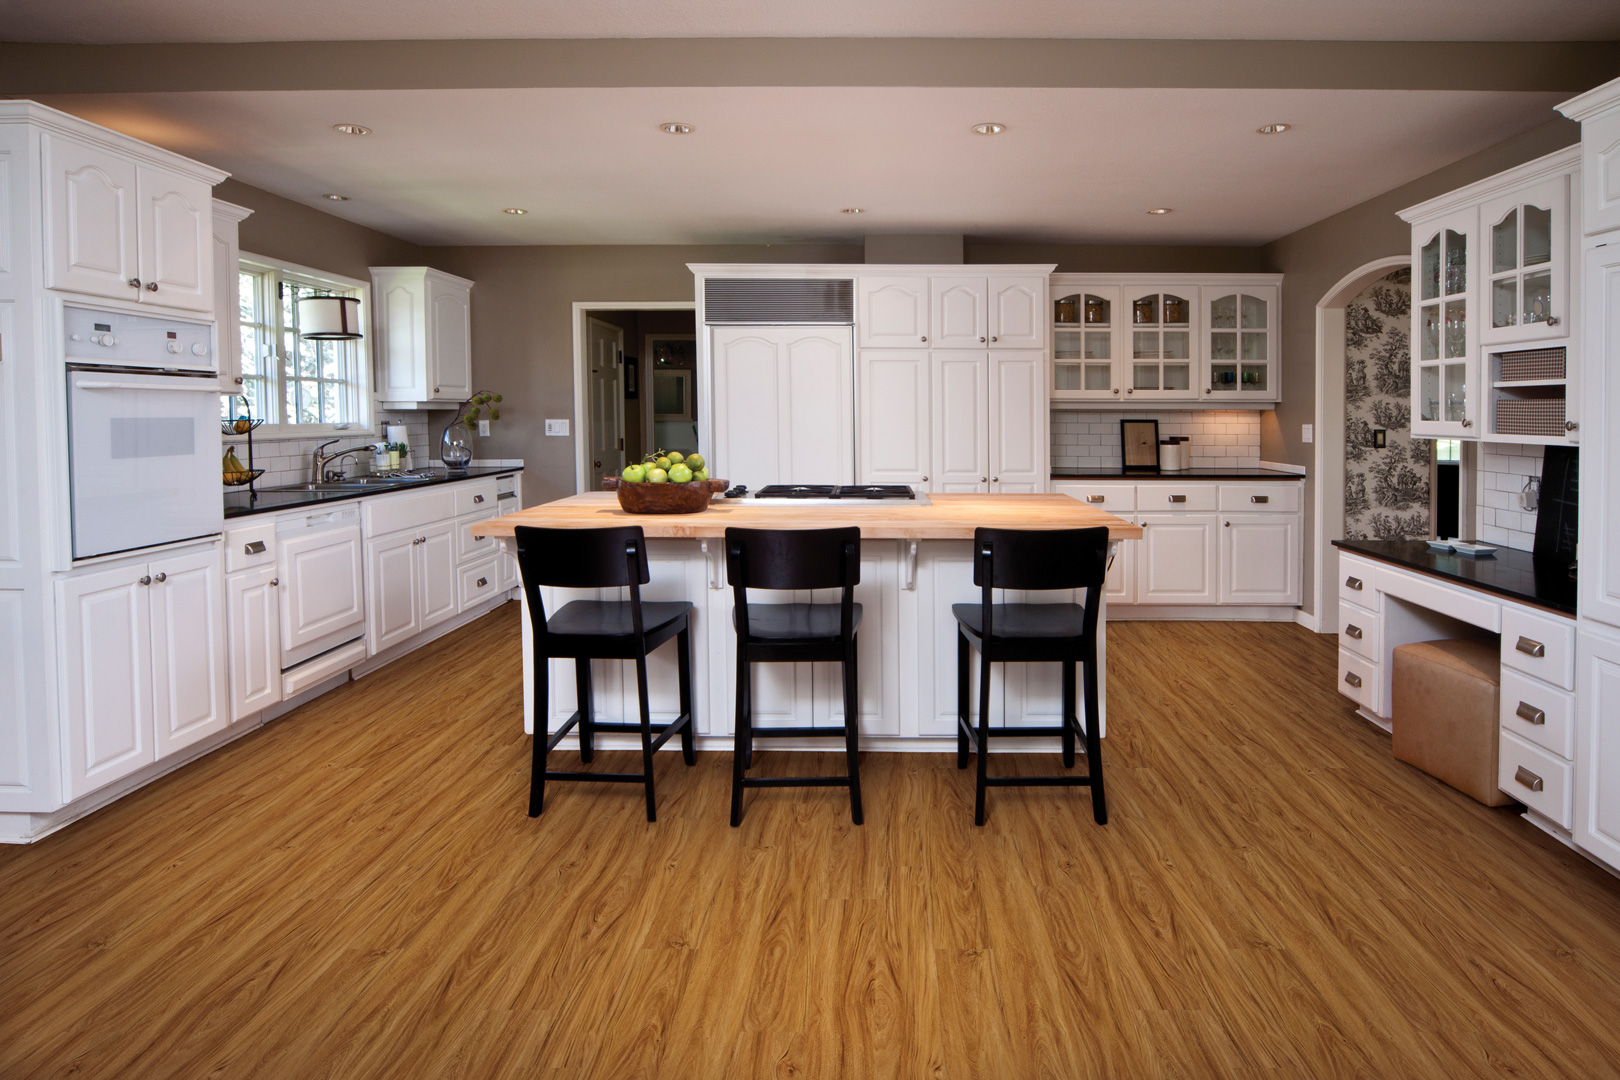 Vinyl plank flooring coretec plus hd xl enhanced design for White kitchen vinyl floor